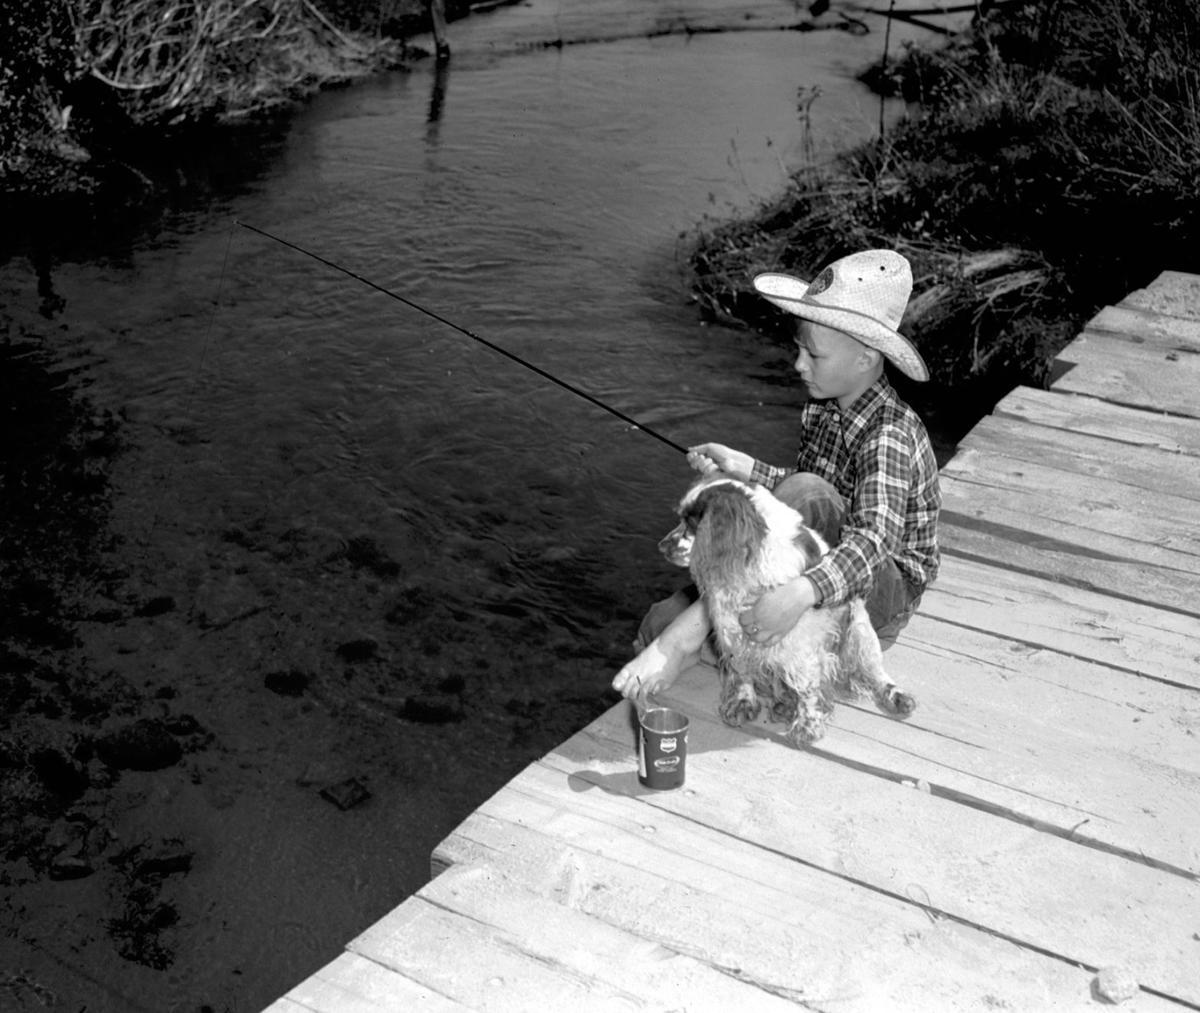 Ernst boy fishing with dog